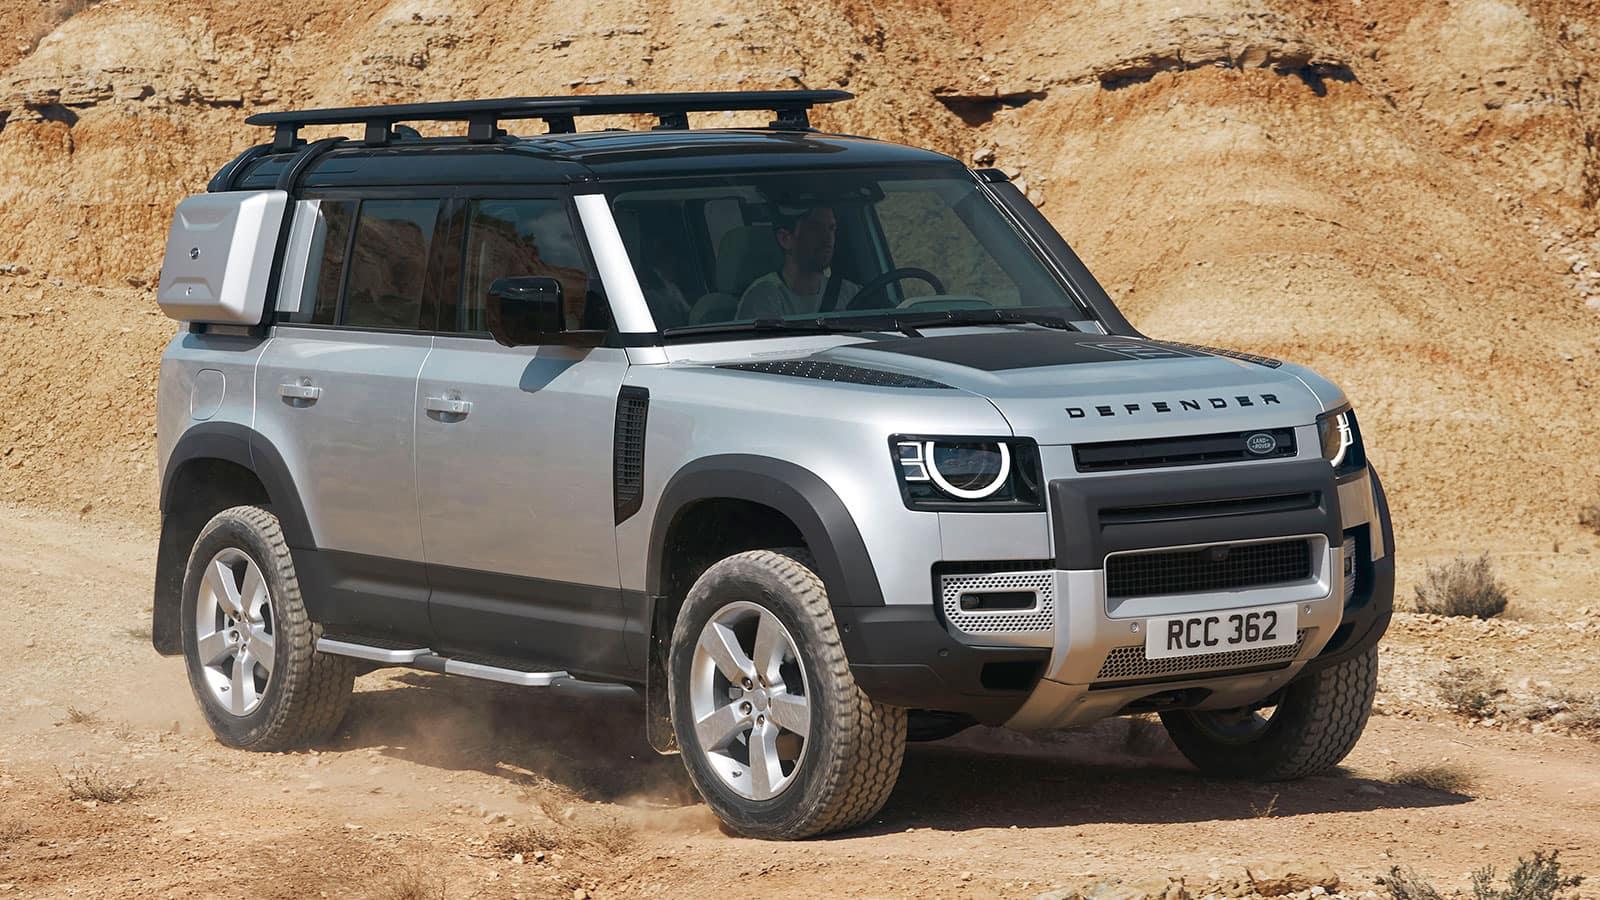 Land Rover Defender 110 Exterior